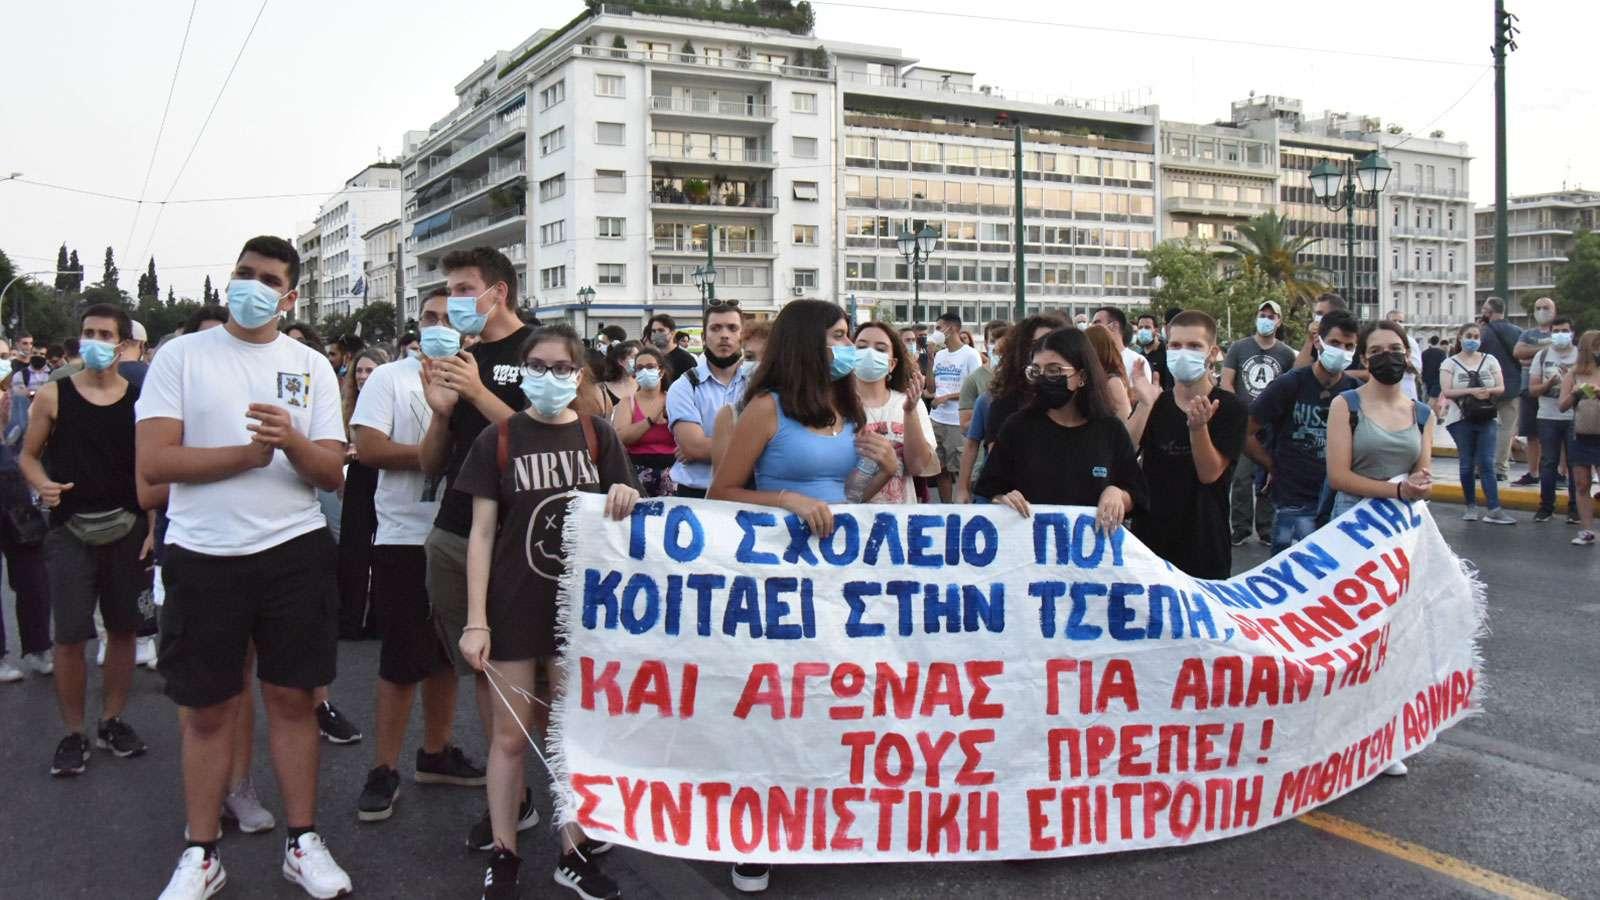 kinhtopoihsh paideia Πανεκπαιδευτικό Σύνταγμα 2